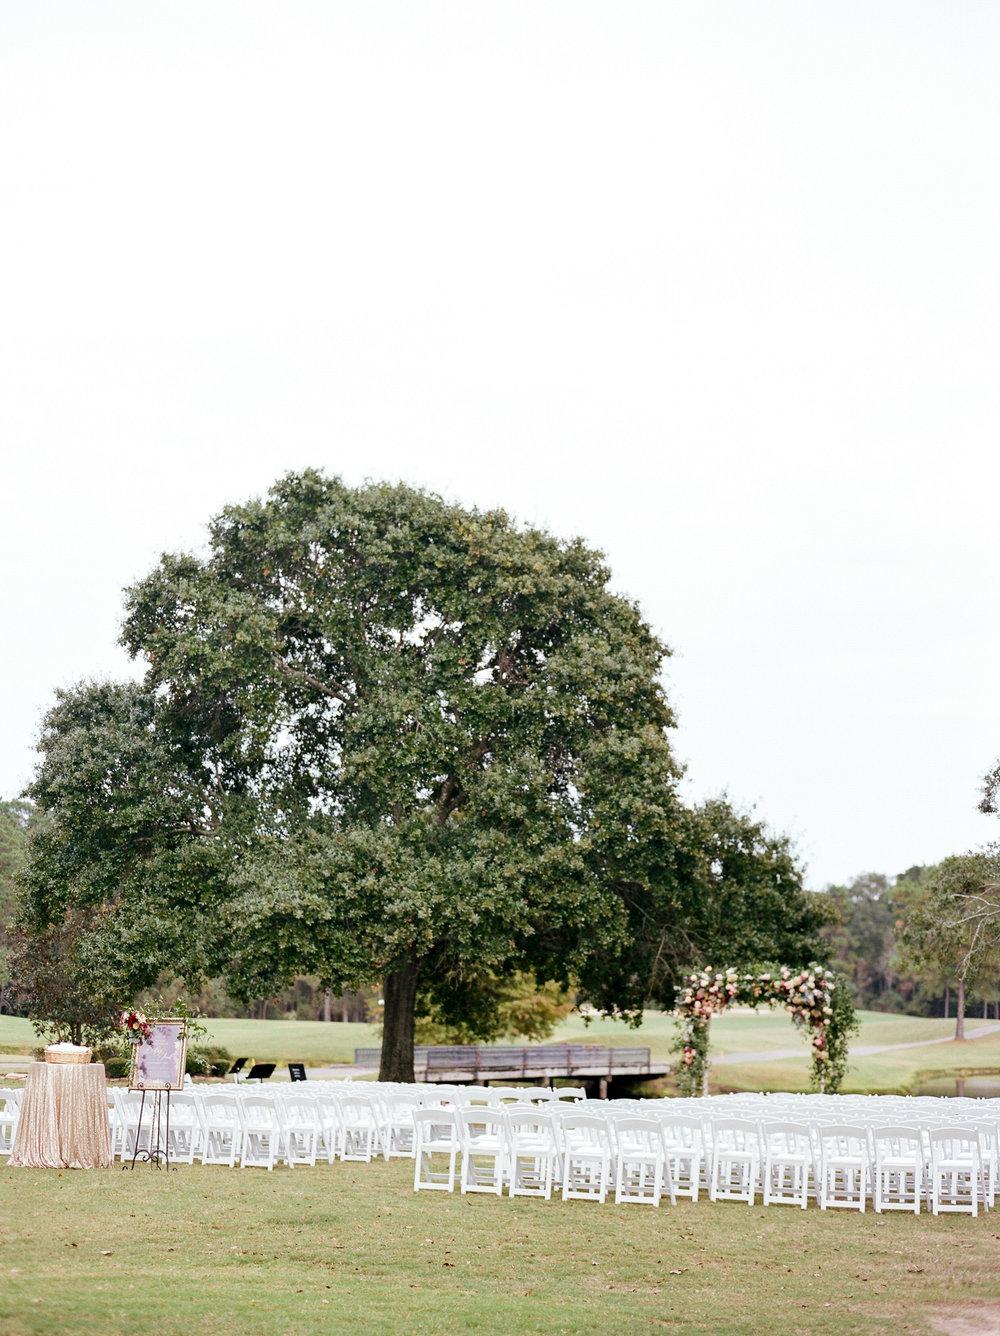 Houston-Wedding-Photographer-Fine-Art-Film-Destination-Style-Me-Pretty-Austin-Dallas-New-Orleans-Dana-Fernandez-Photography-The Woodlands-Country-Club-13.jpg